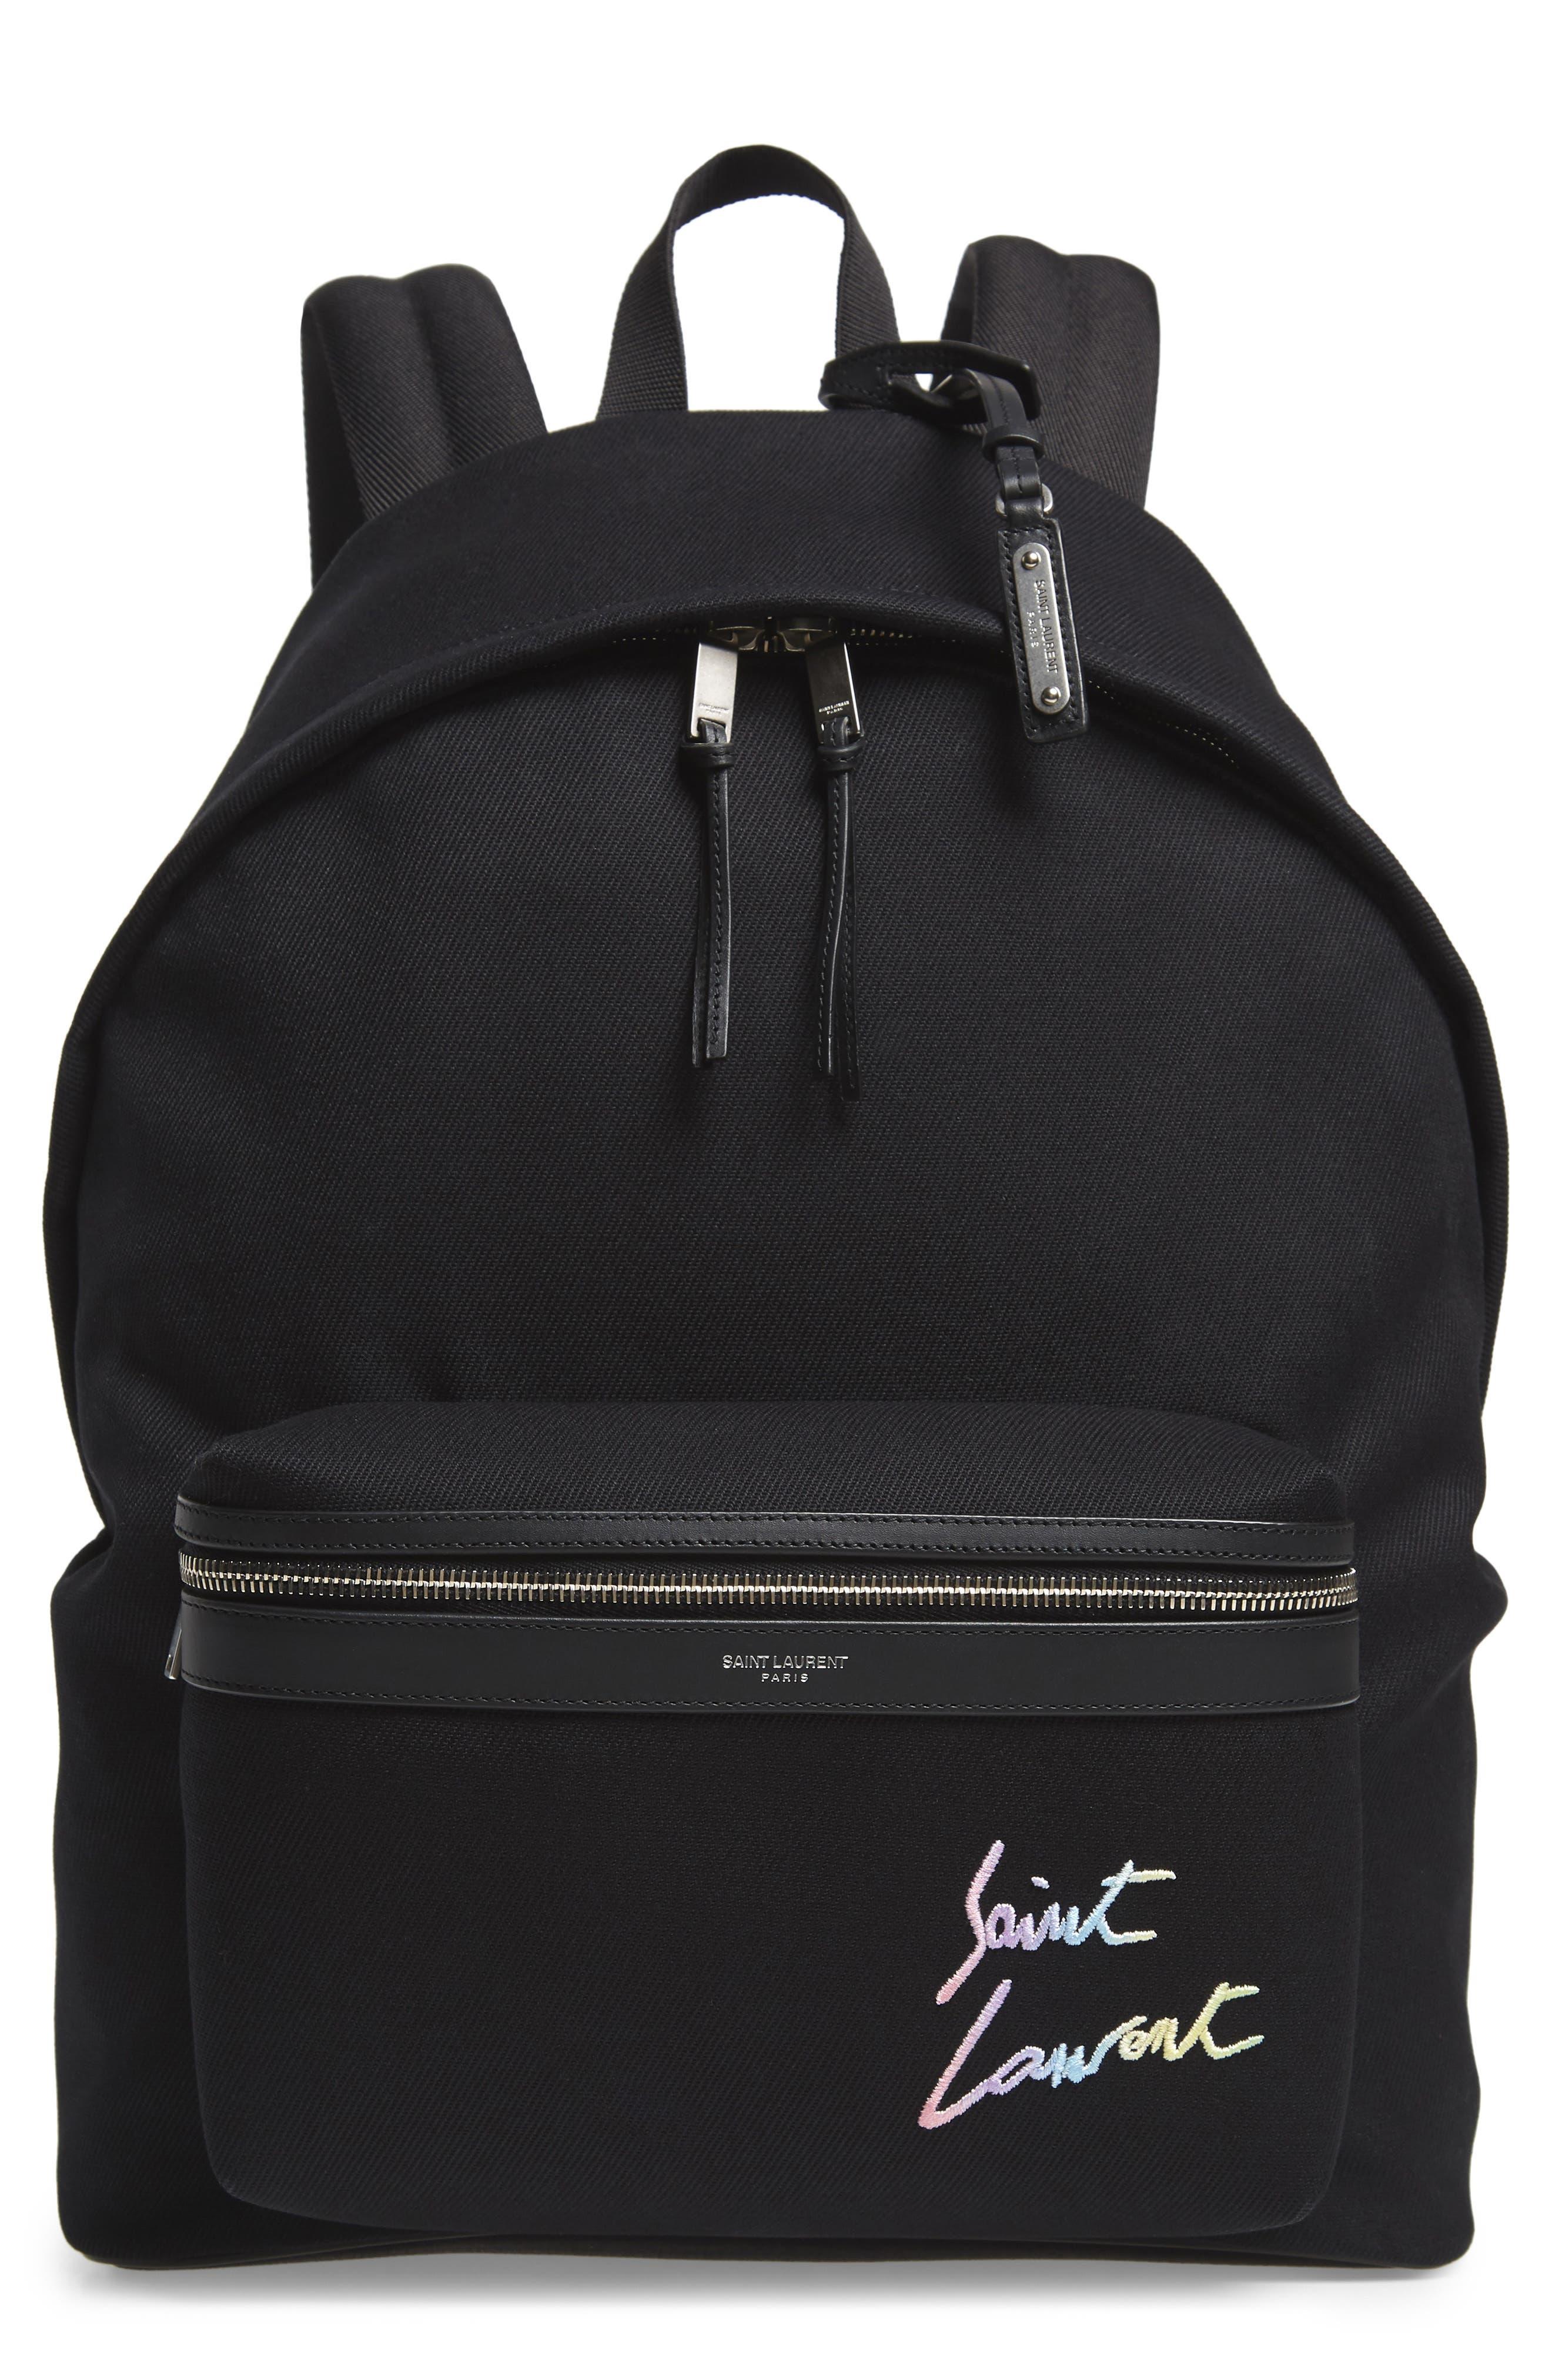 City Canvas Backpack,                             Main thumbnail 1, color,                             BLACK